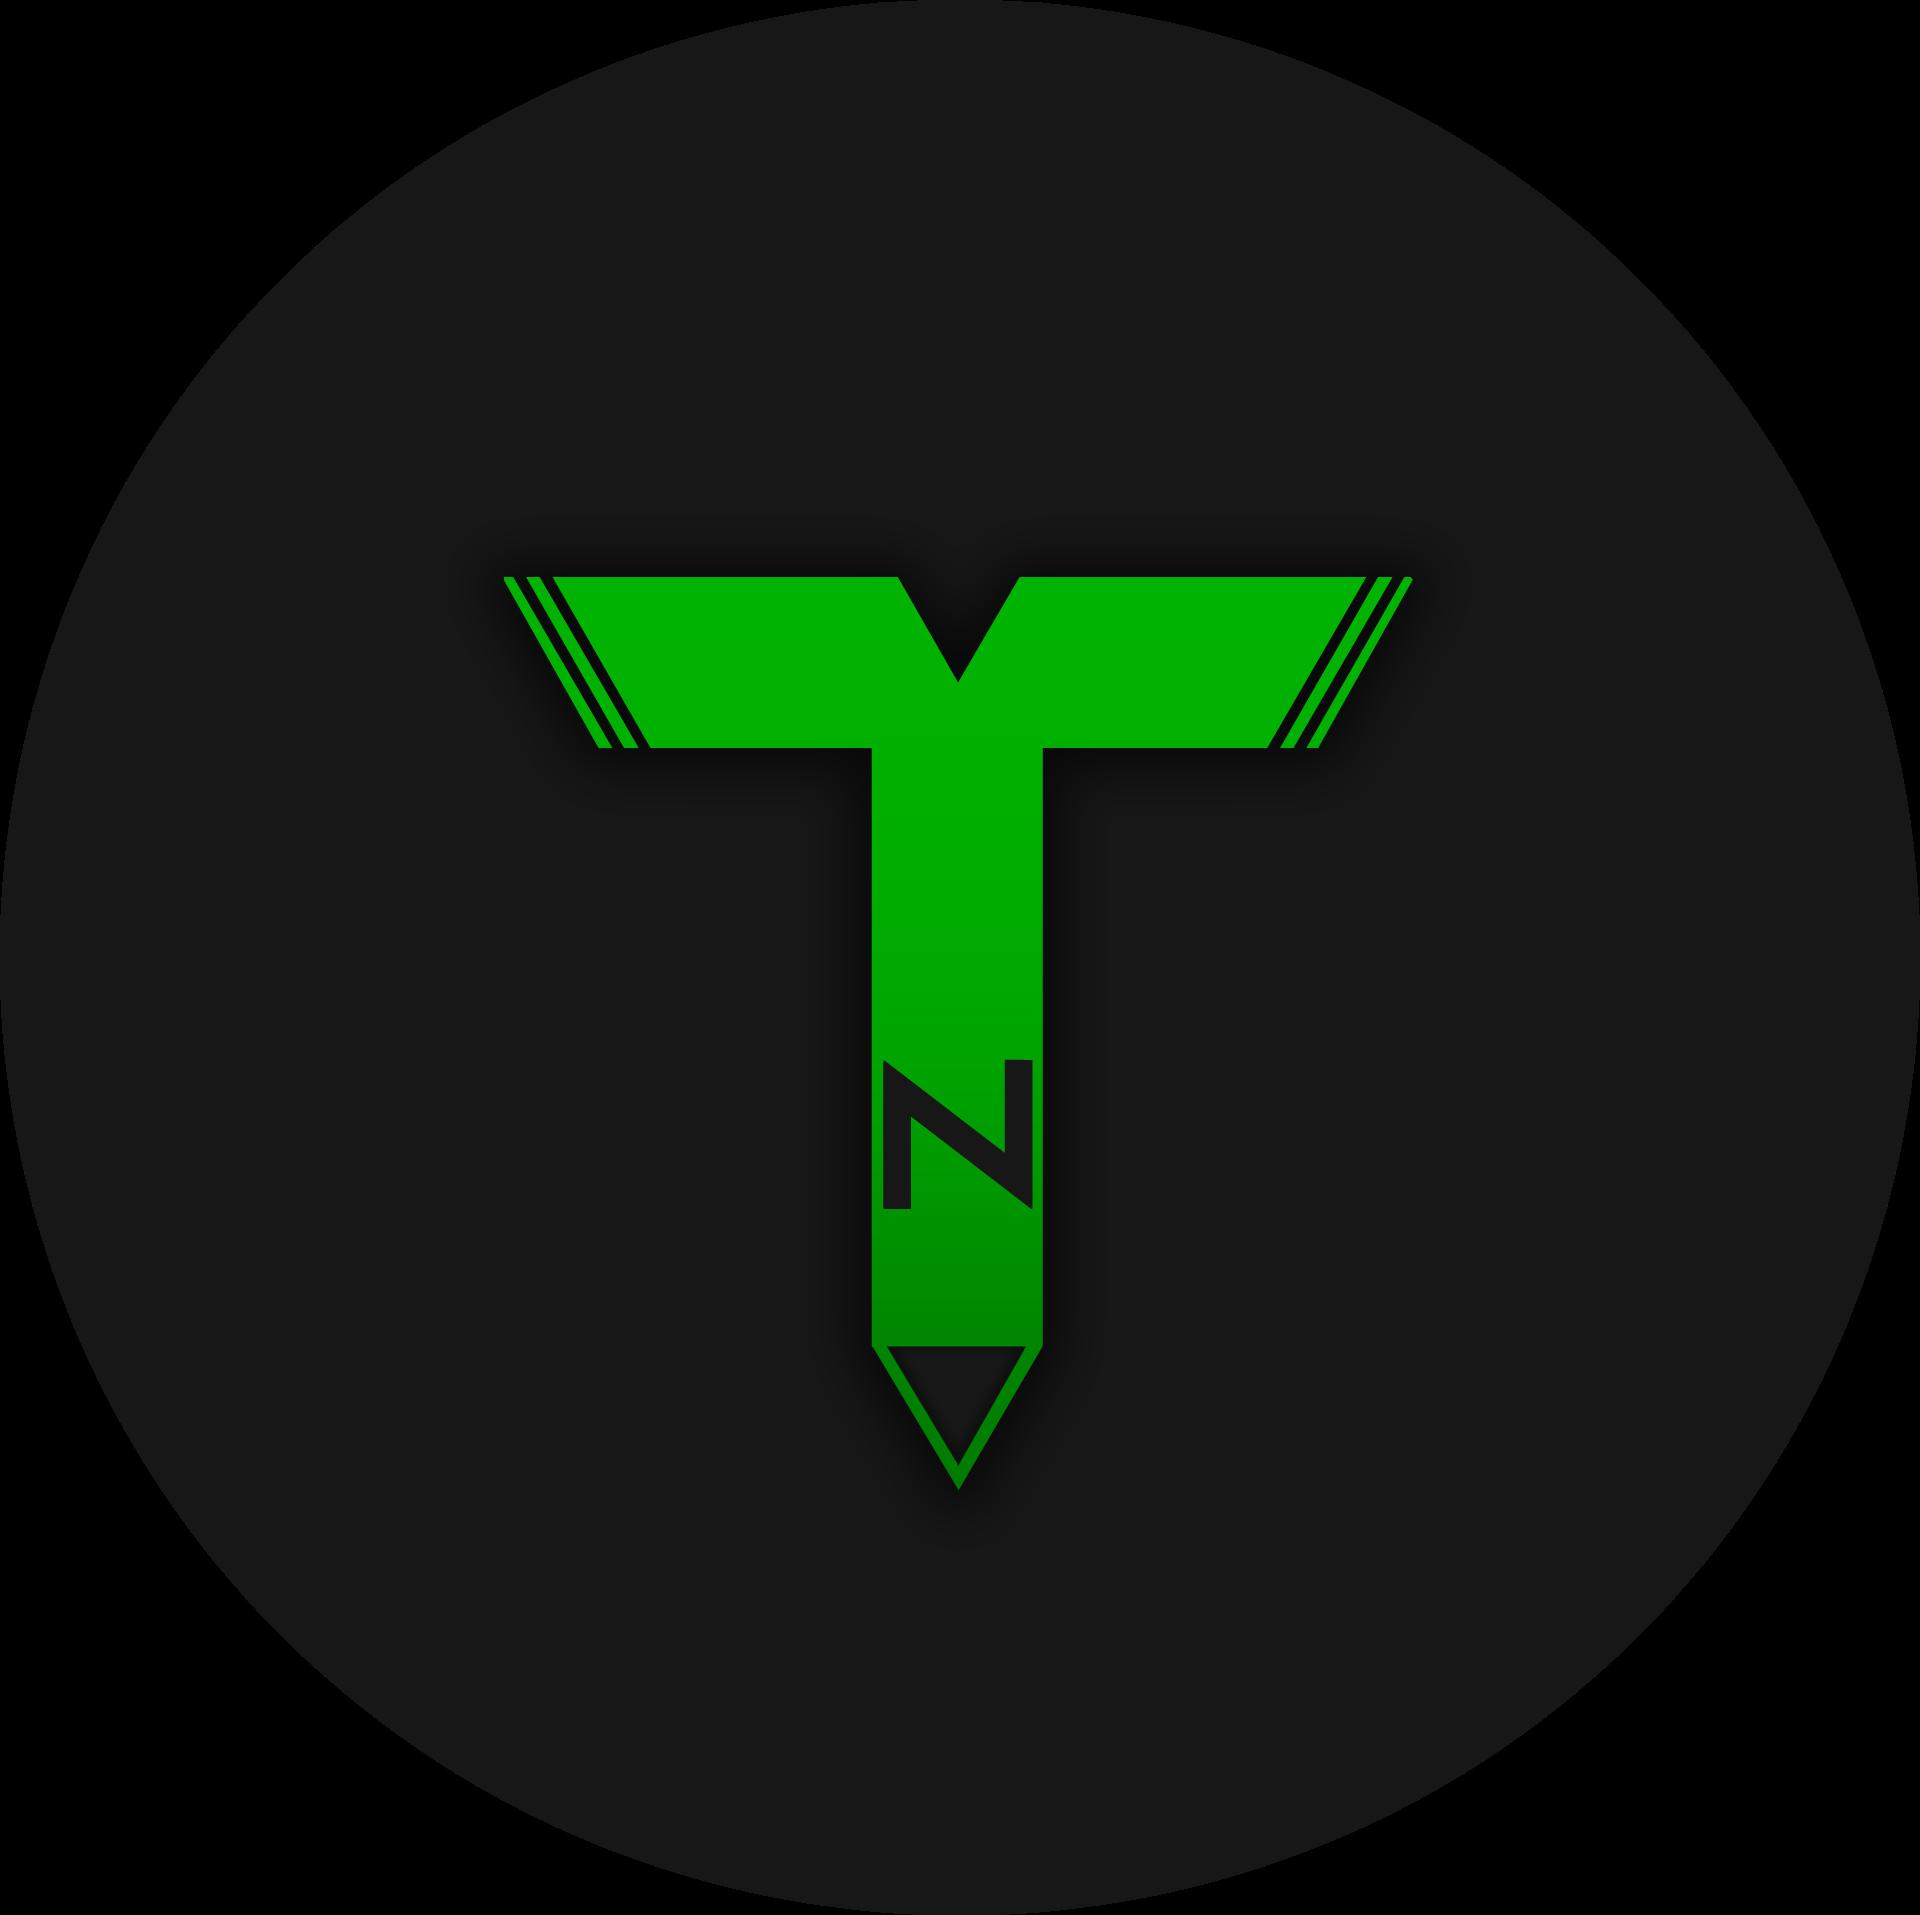 Thanlex.net